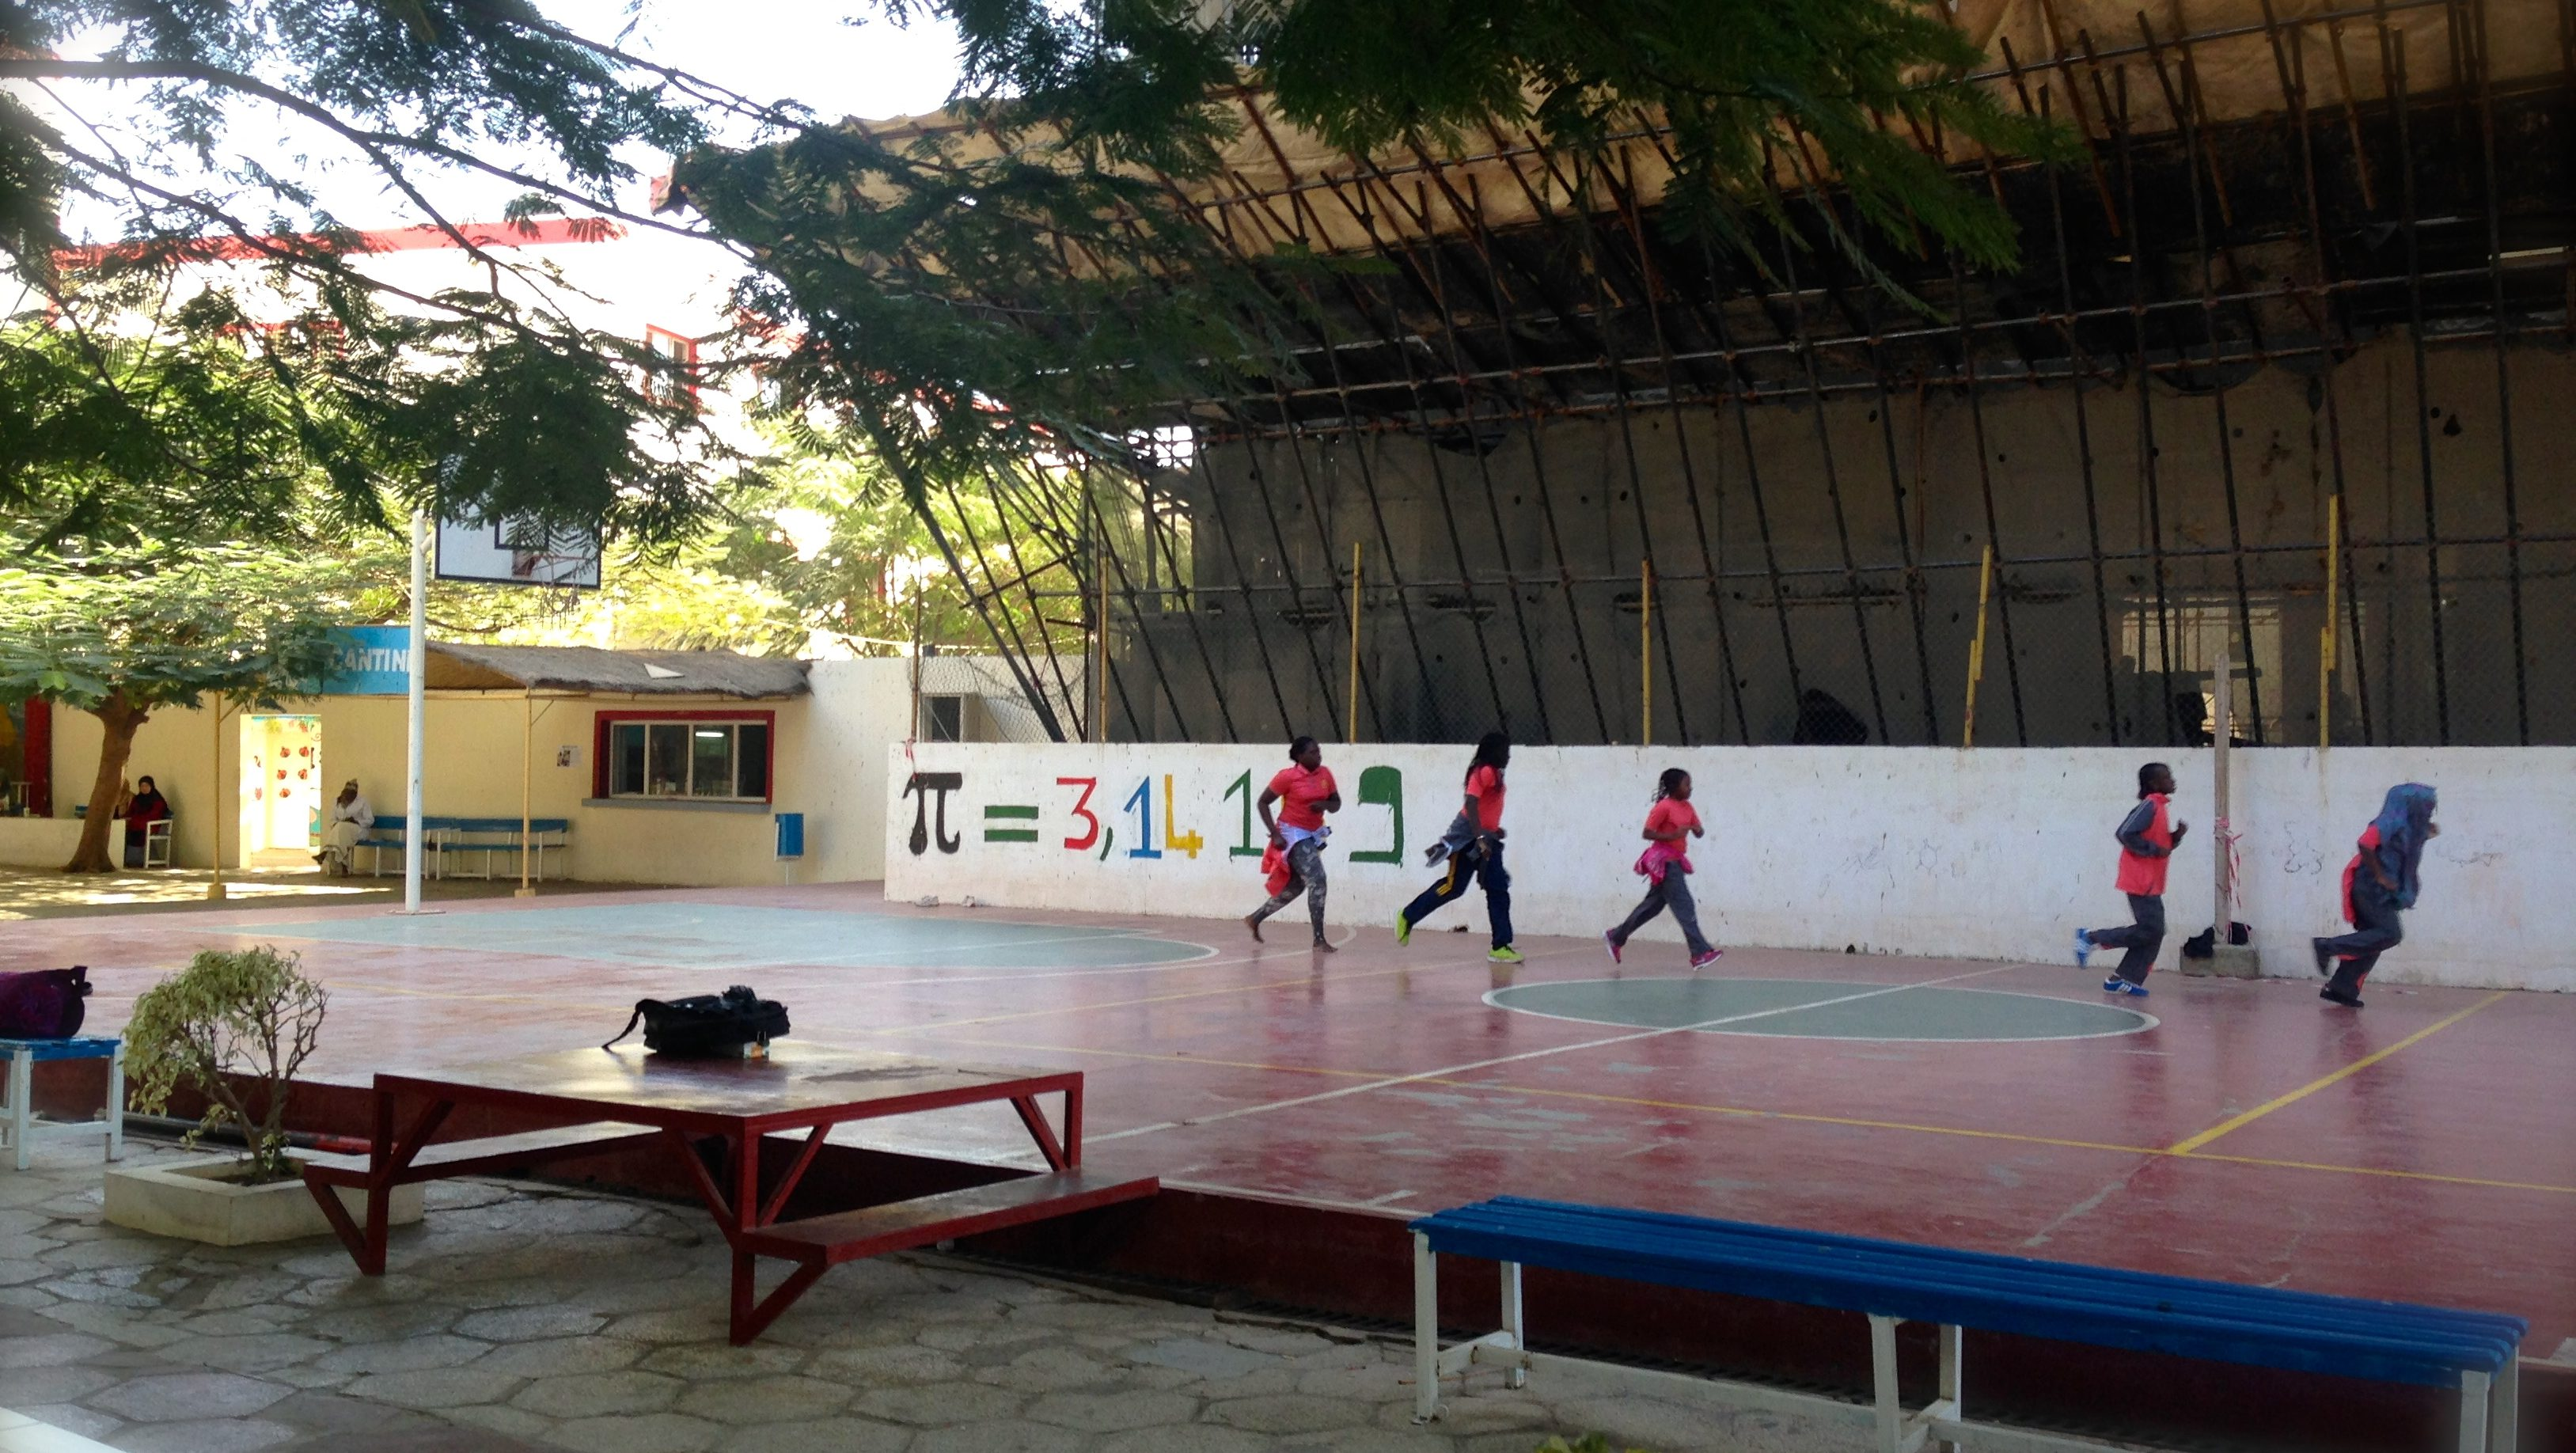 Collège Sultan, an all-girls school part of Yavuz Selim in Dakar.